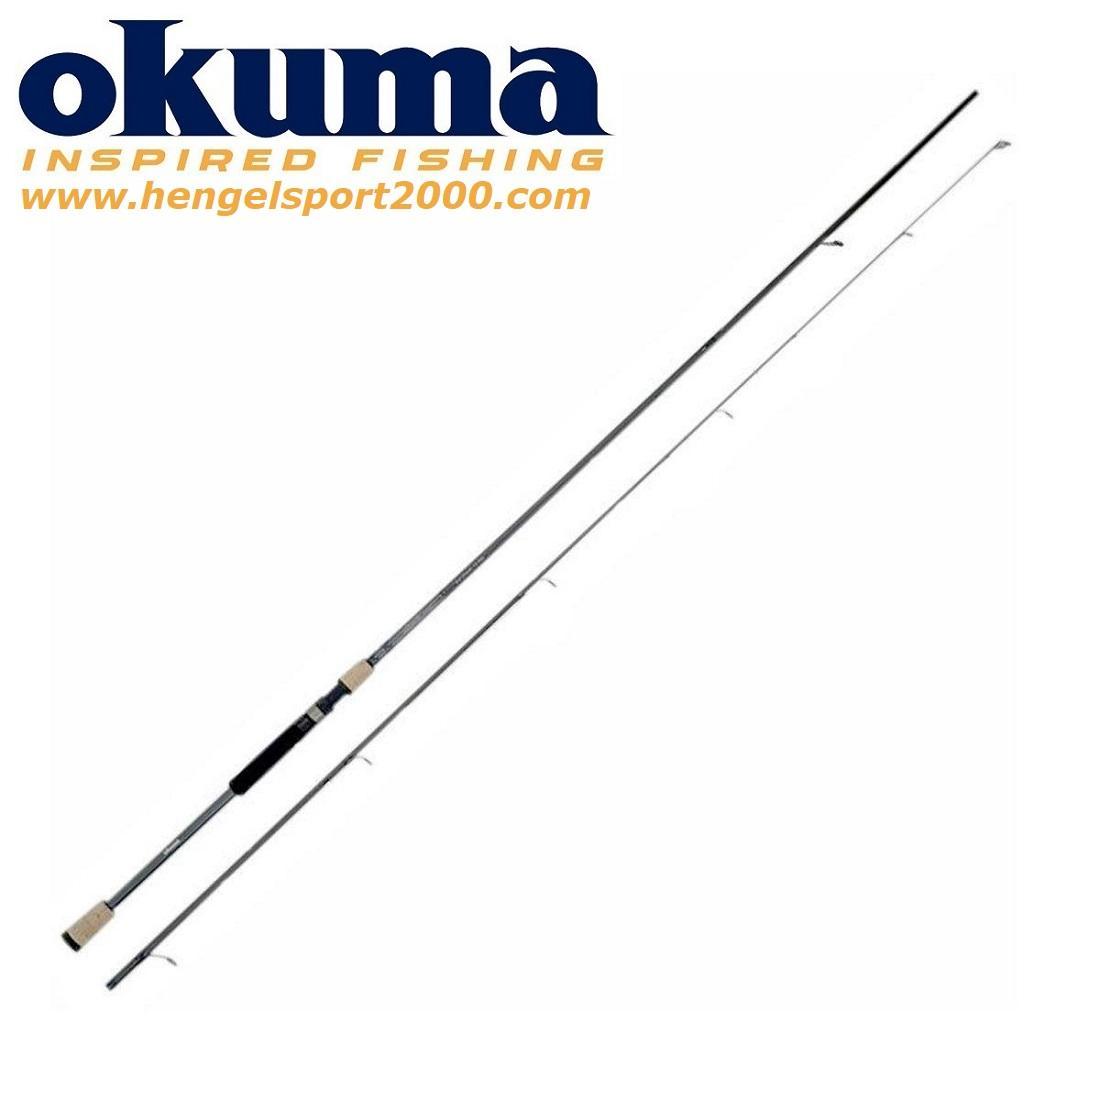 Okuma Azaki Spin 228cm 8 - 25 gram